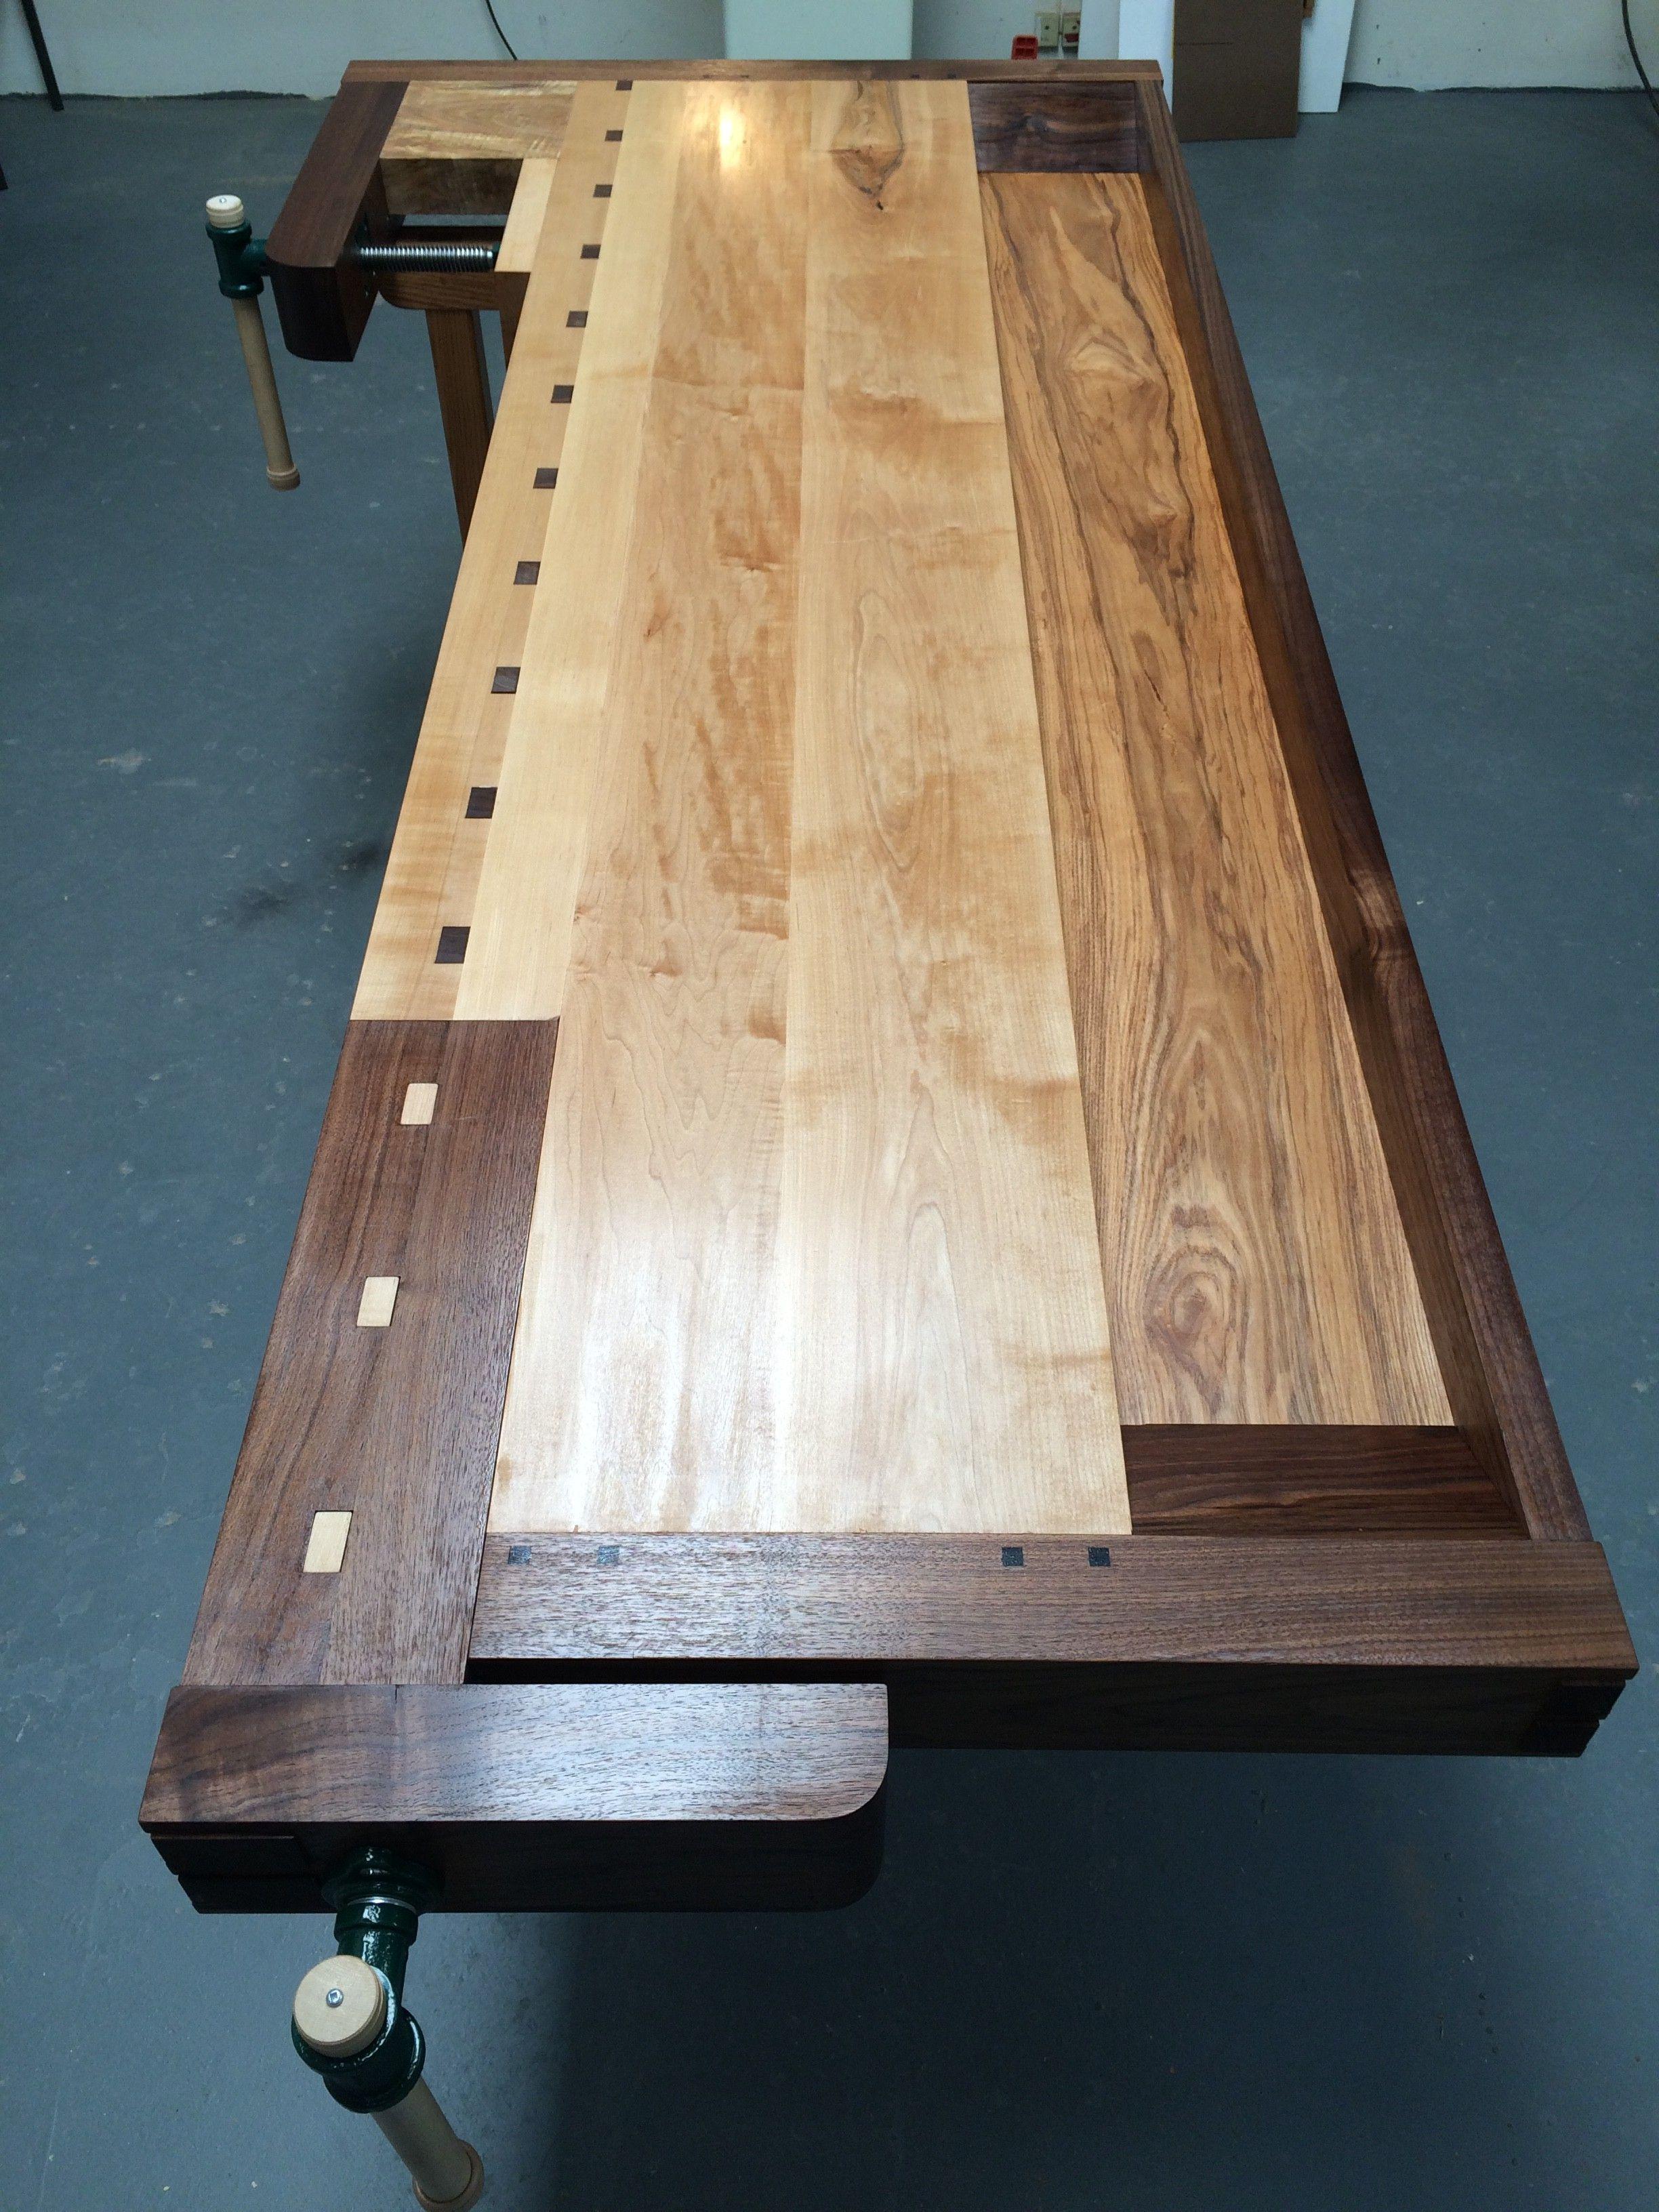 Greene & Greene Inspired Workbench - Reader's Gallery - Fine Woodworking